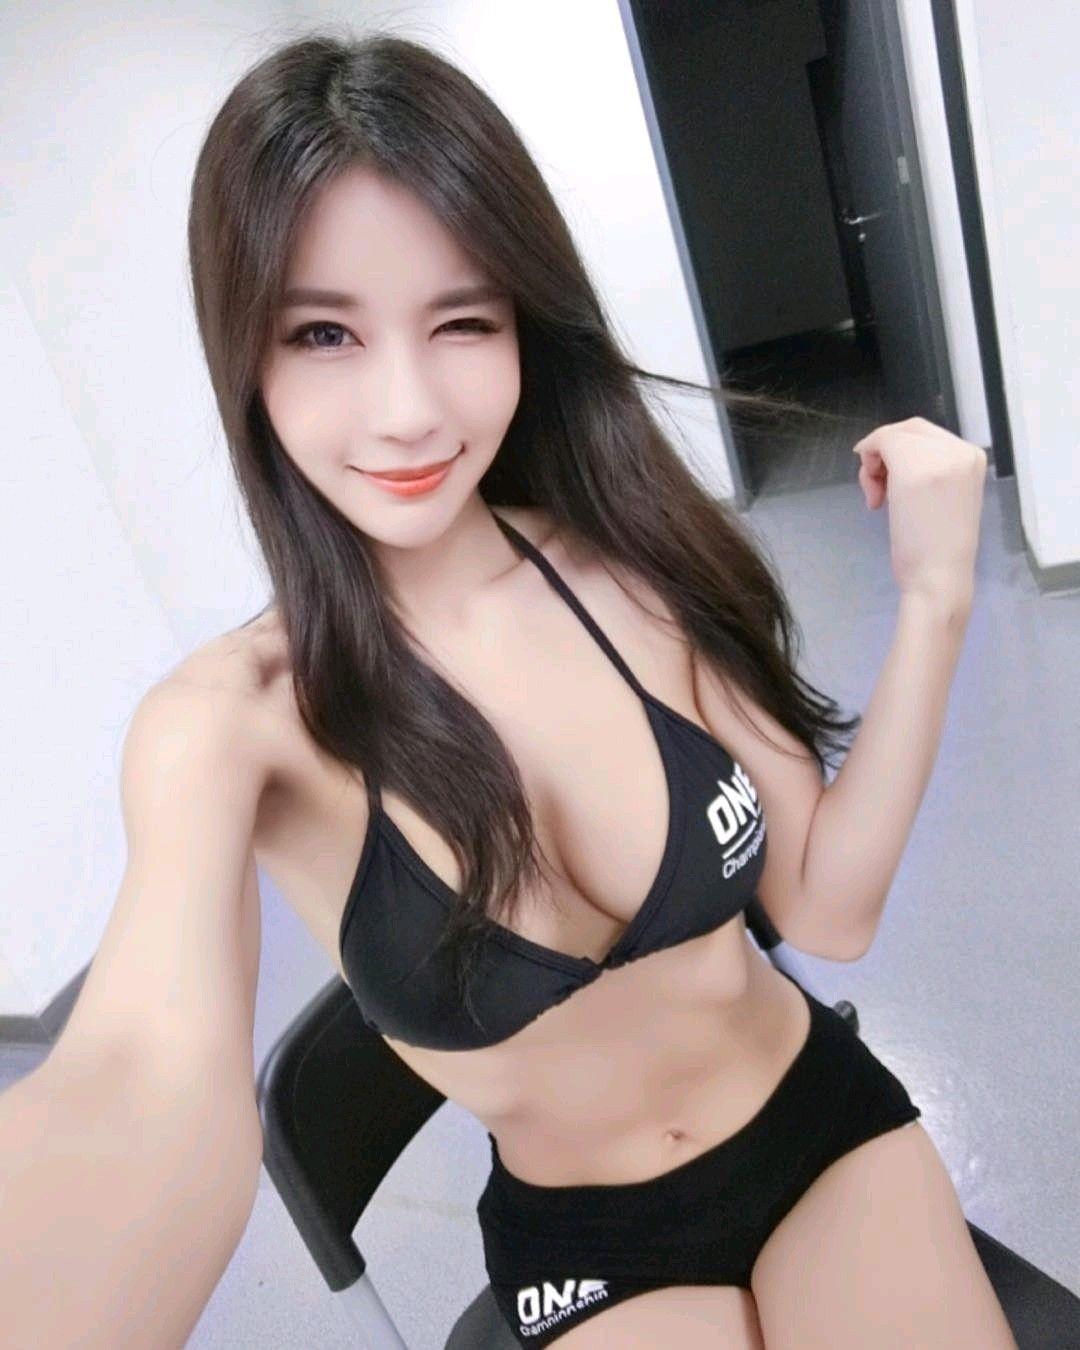 singapore-sex-girl